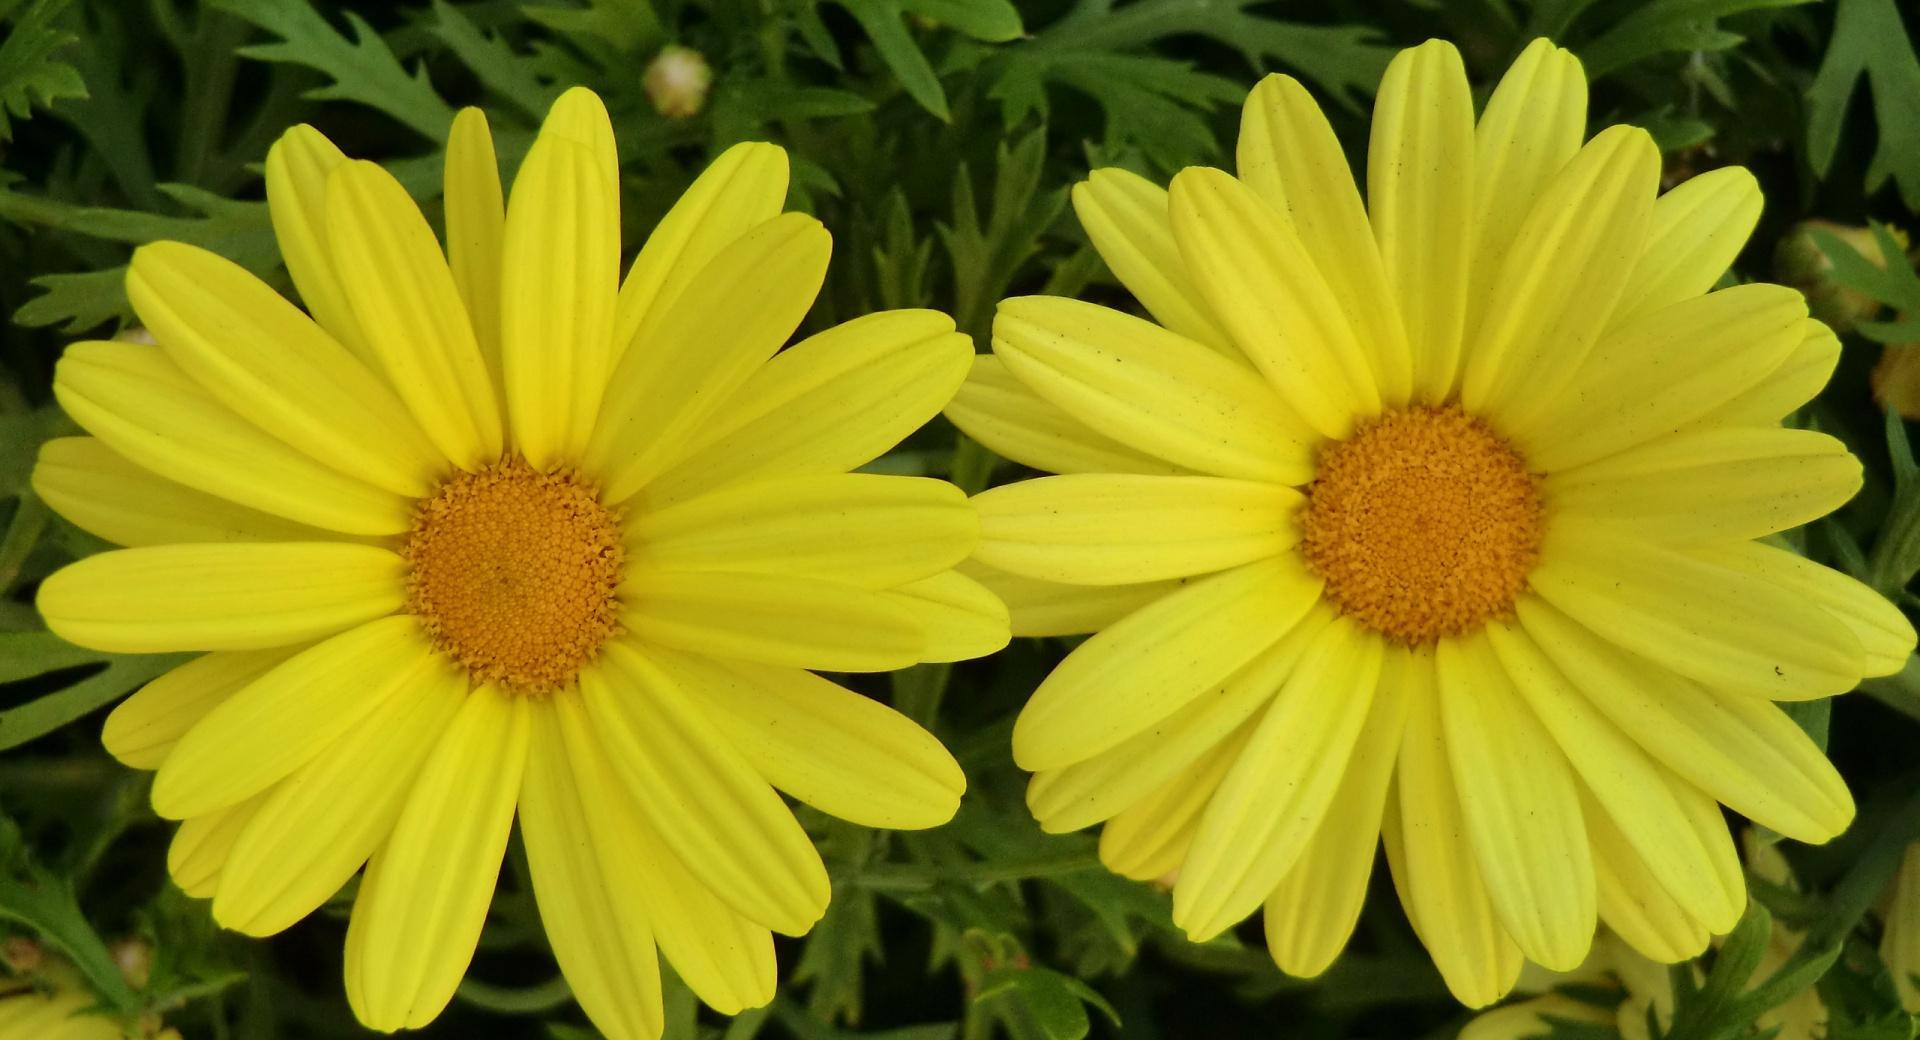 Gira Flower wallpapers HD quality